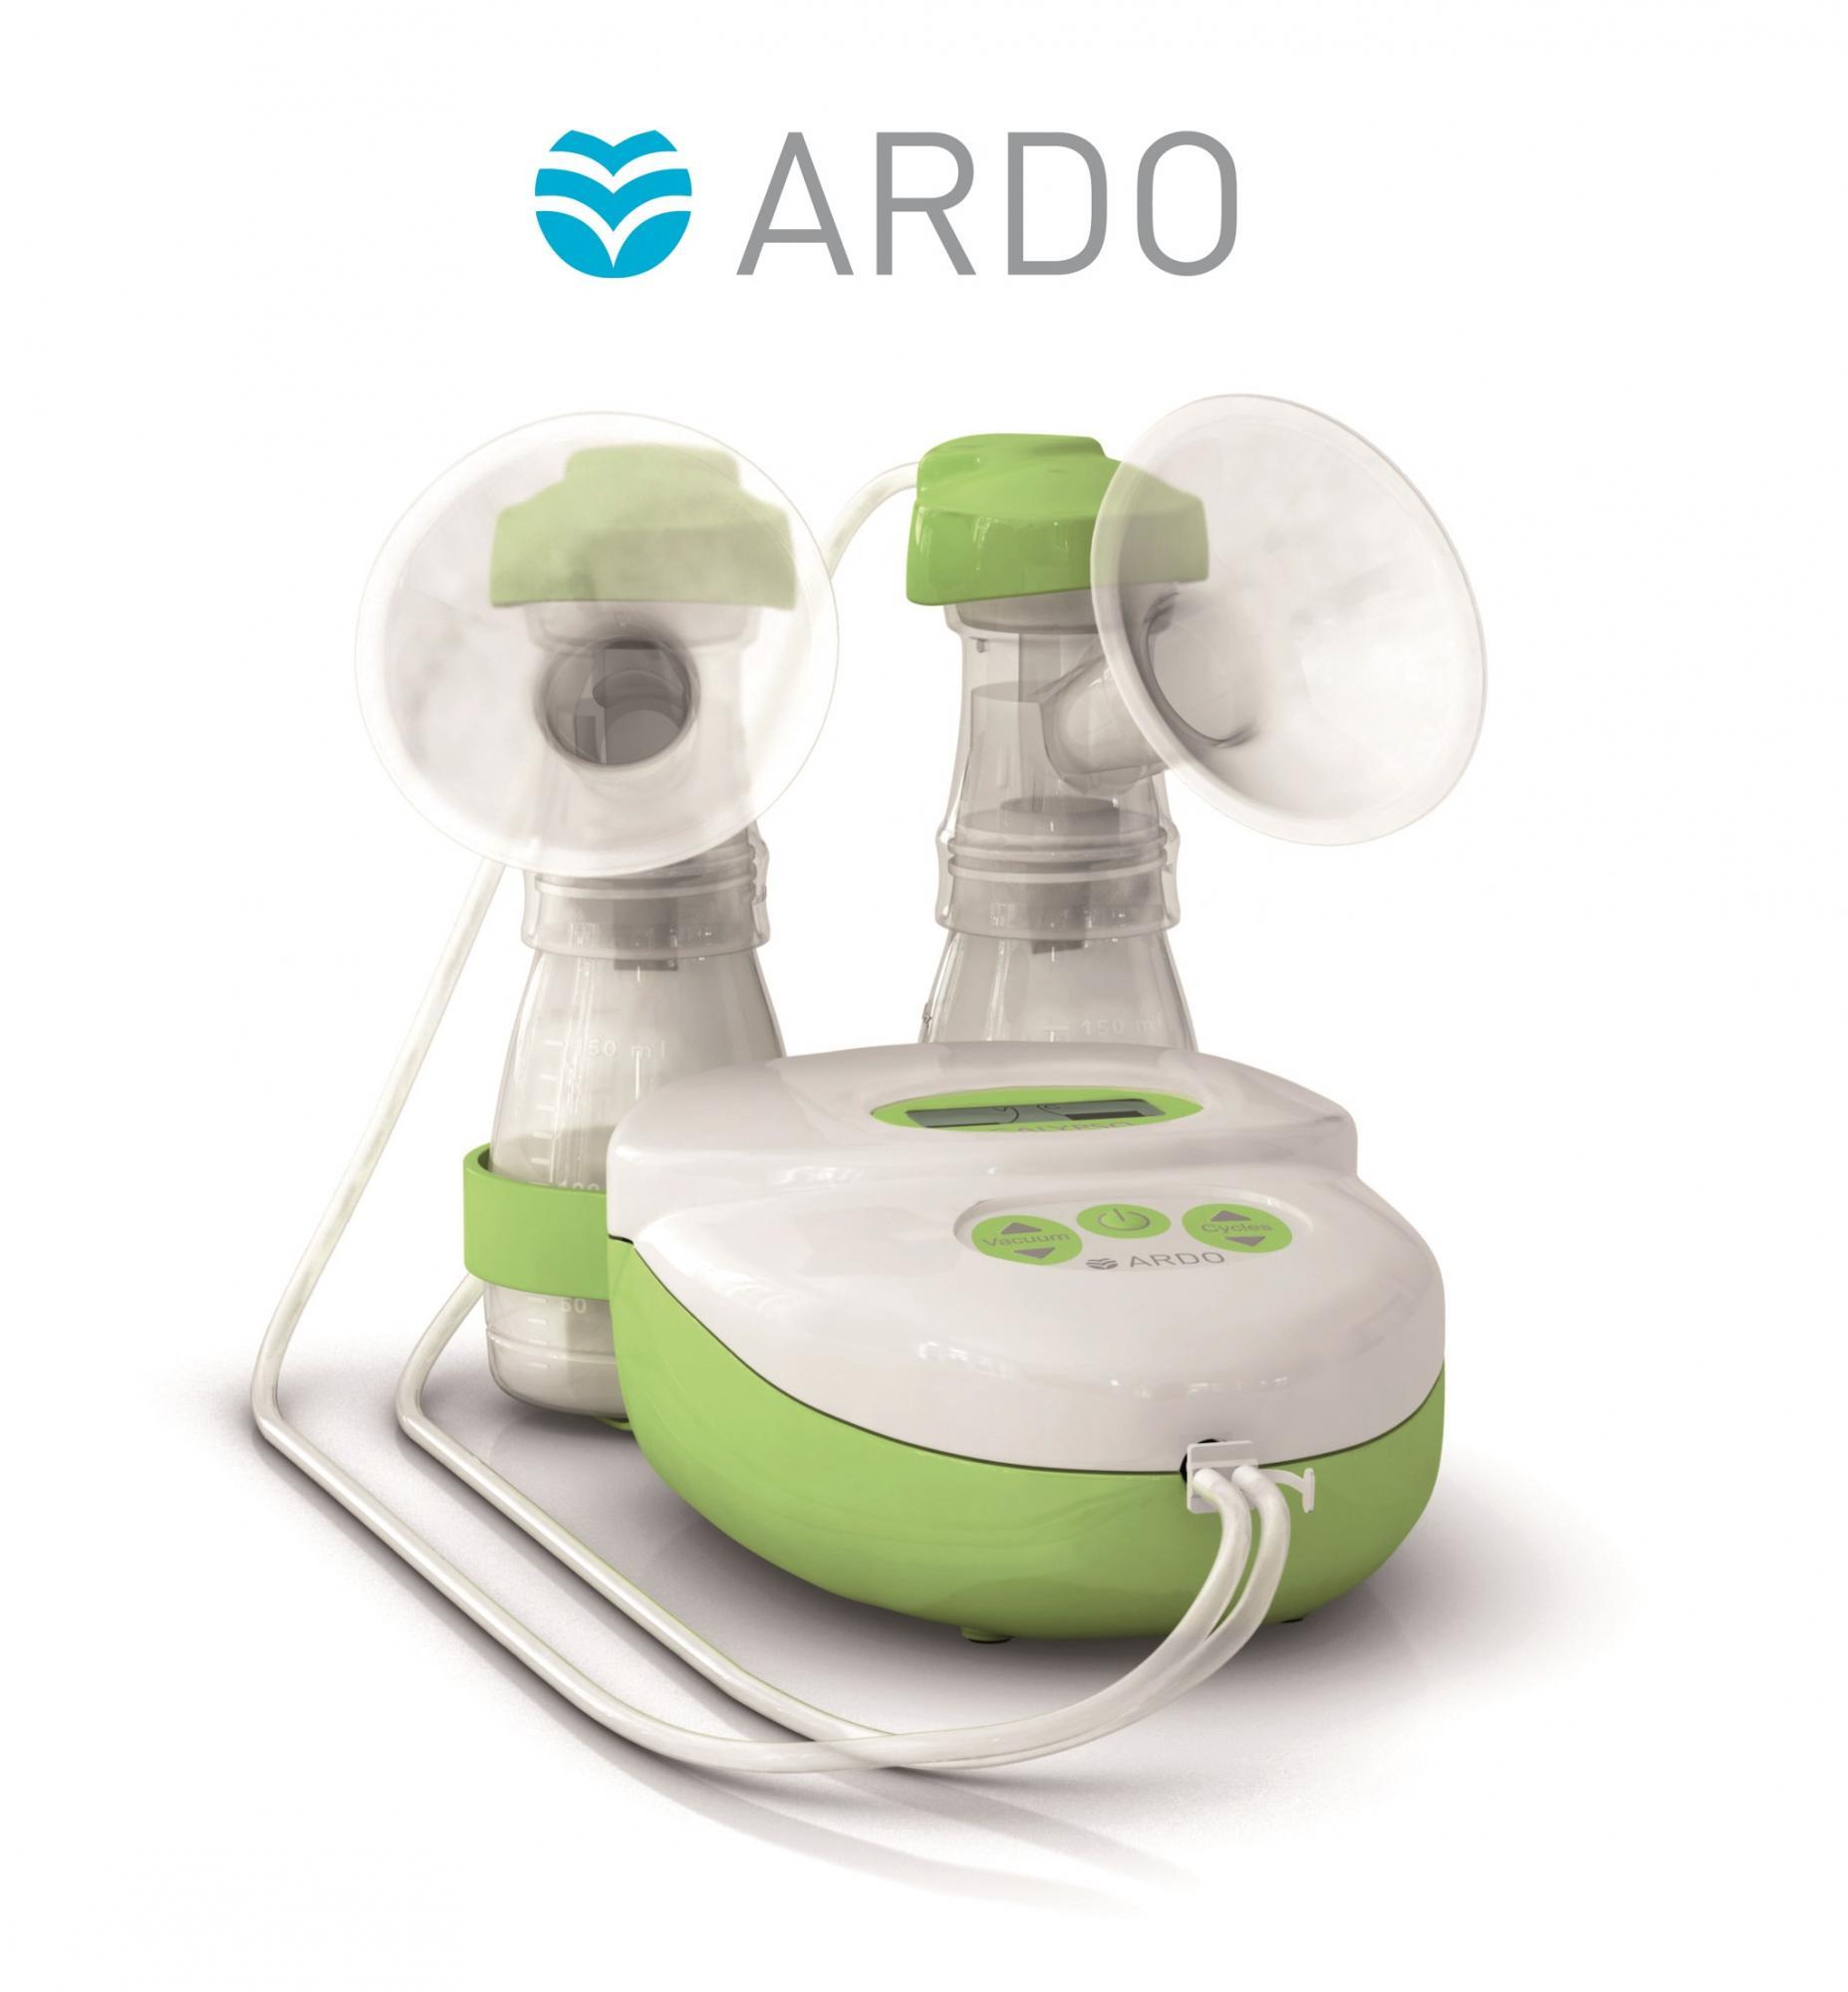 ardo-calypso-double-plus-product-2.jpg